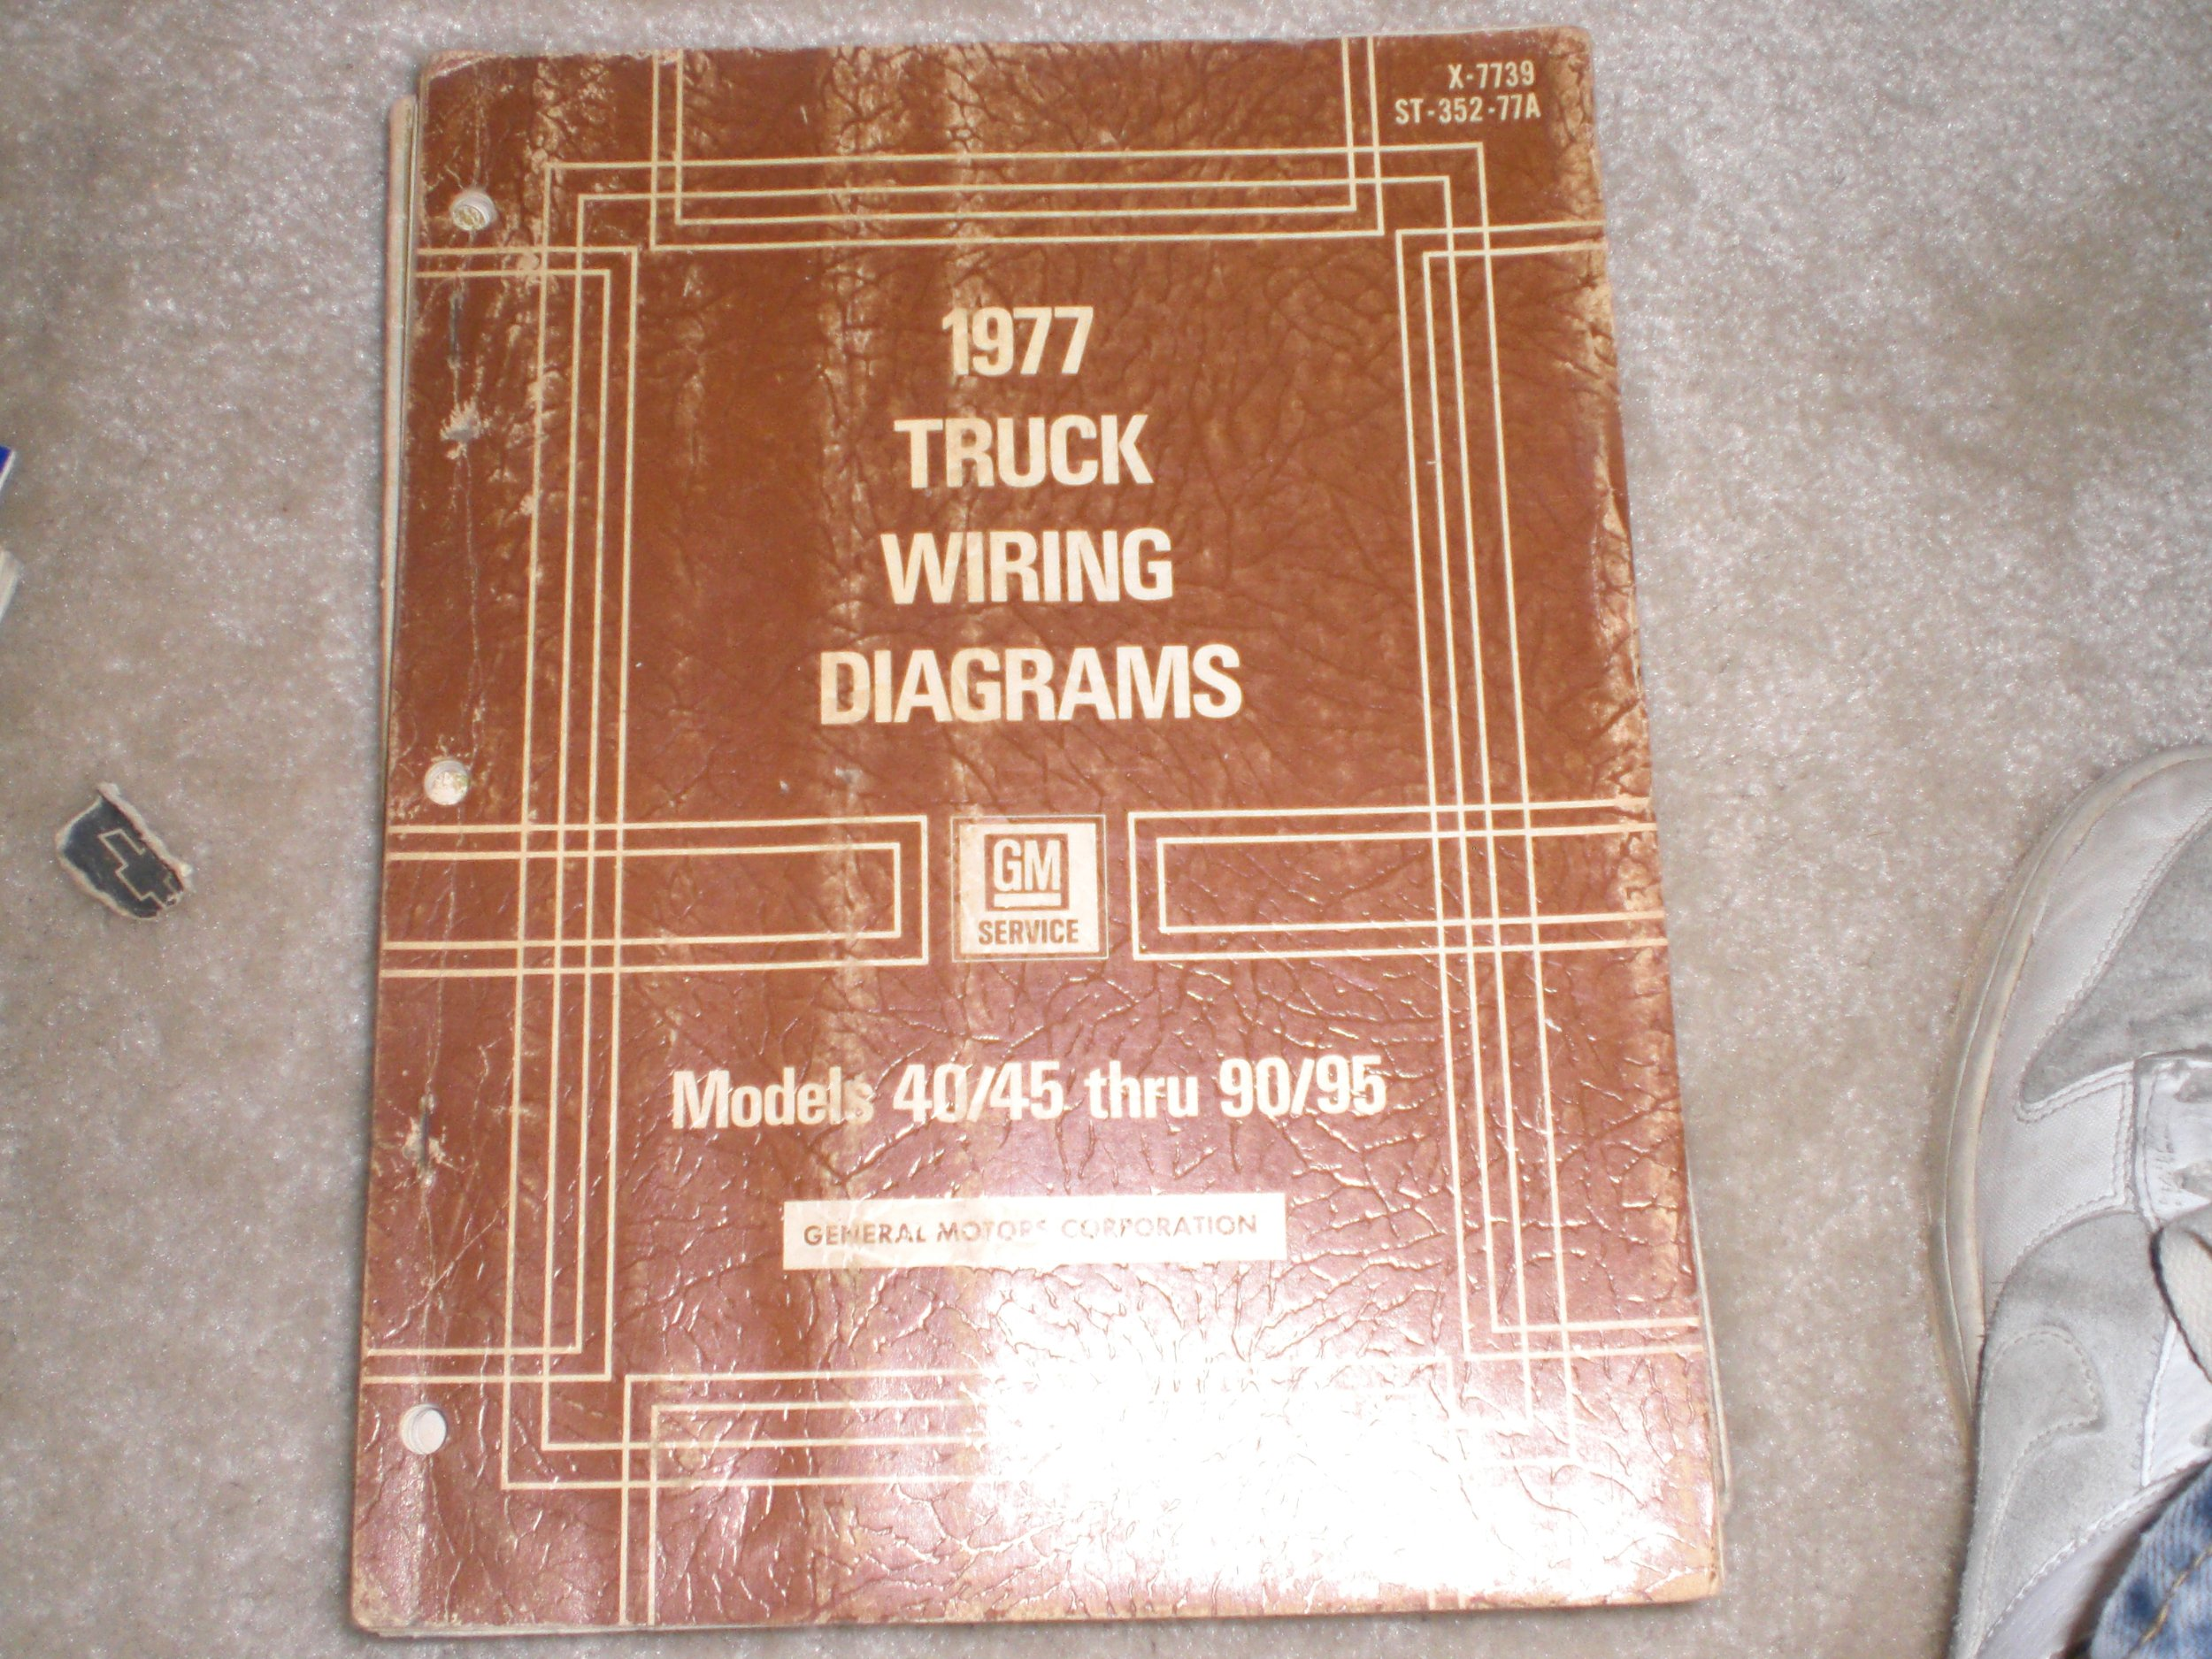 1977 gmc truck wiring diagrams for models 40/45 thru 90/95 paperback – 1977